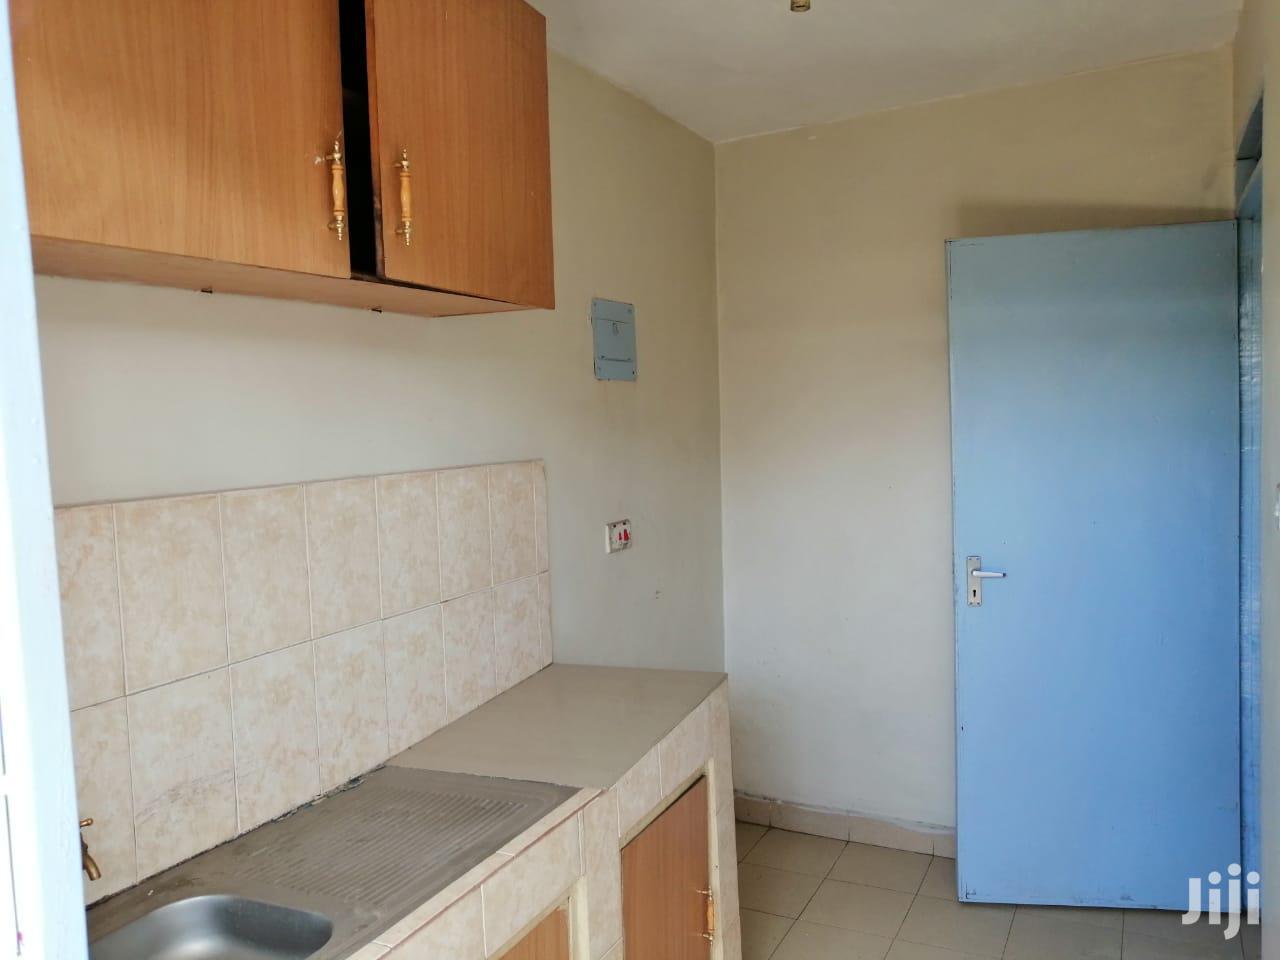 2 Bedrooms to Let in Mawanga,Nakuru | Houses & Apartments For Rent for sale in Nakuru East, Nakuru, Kenya